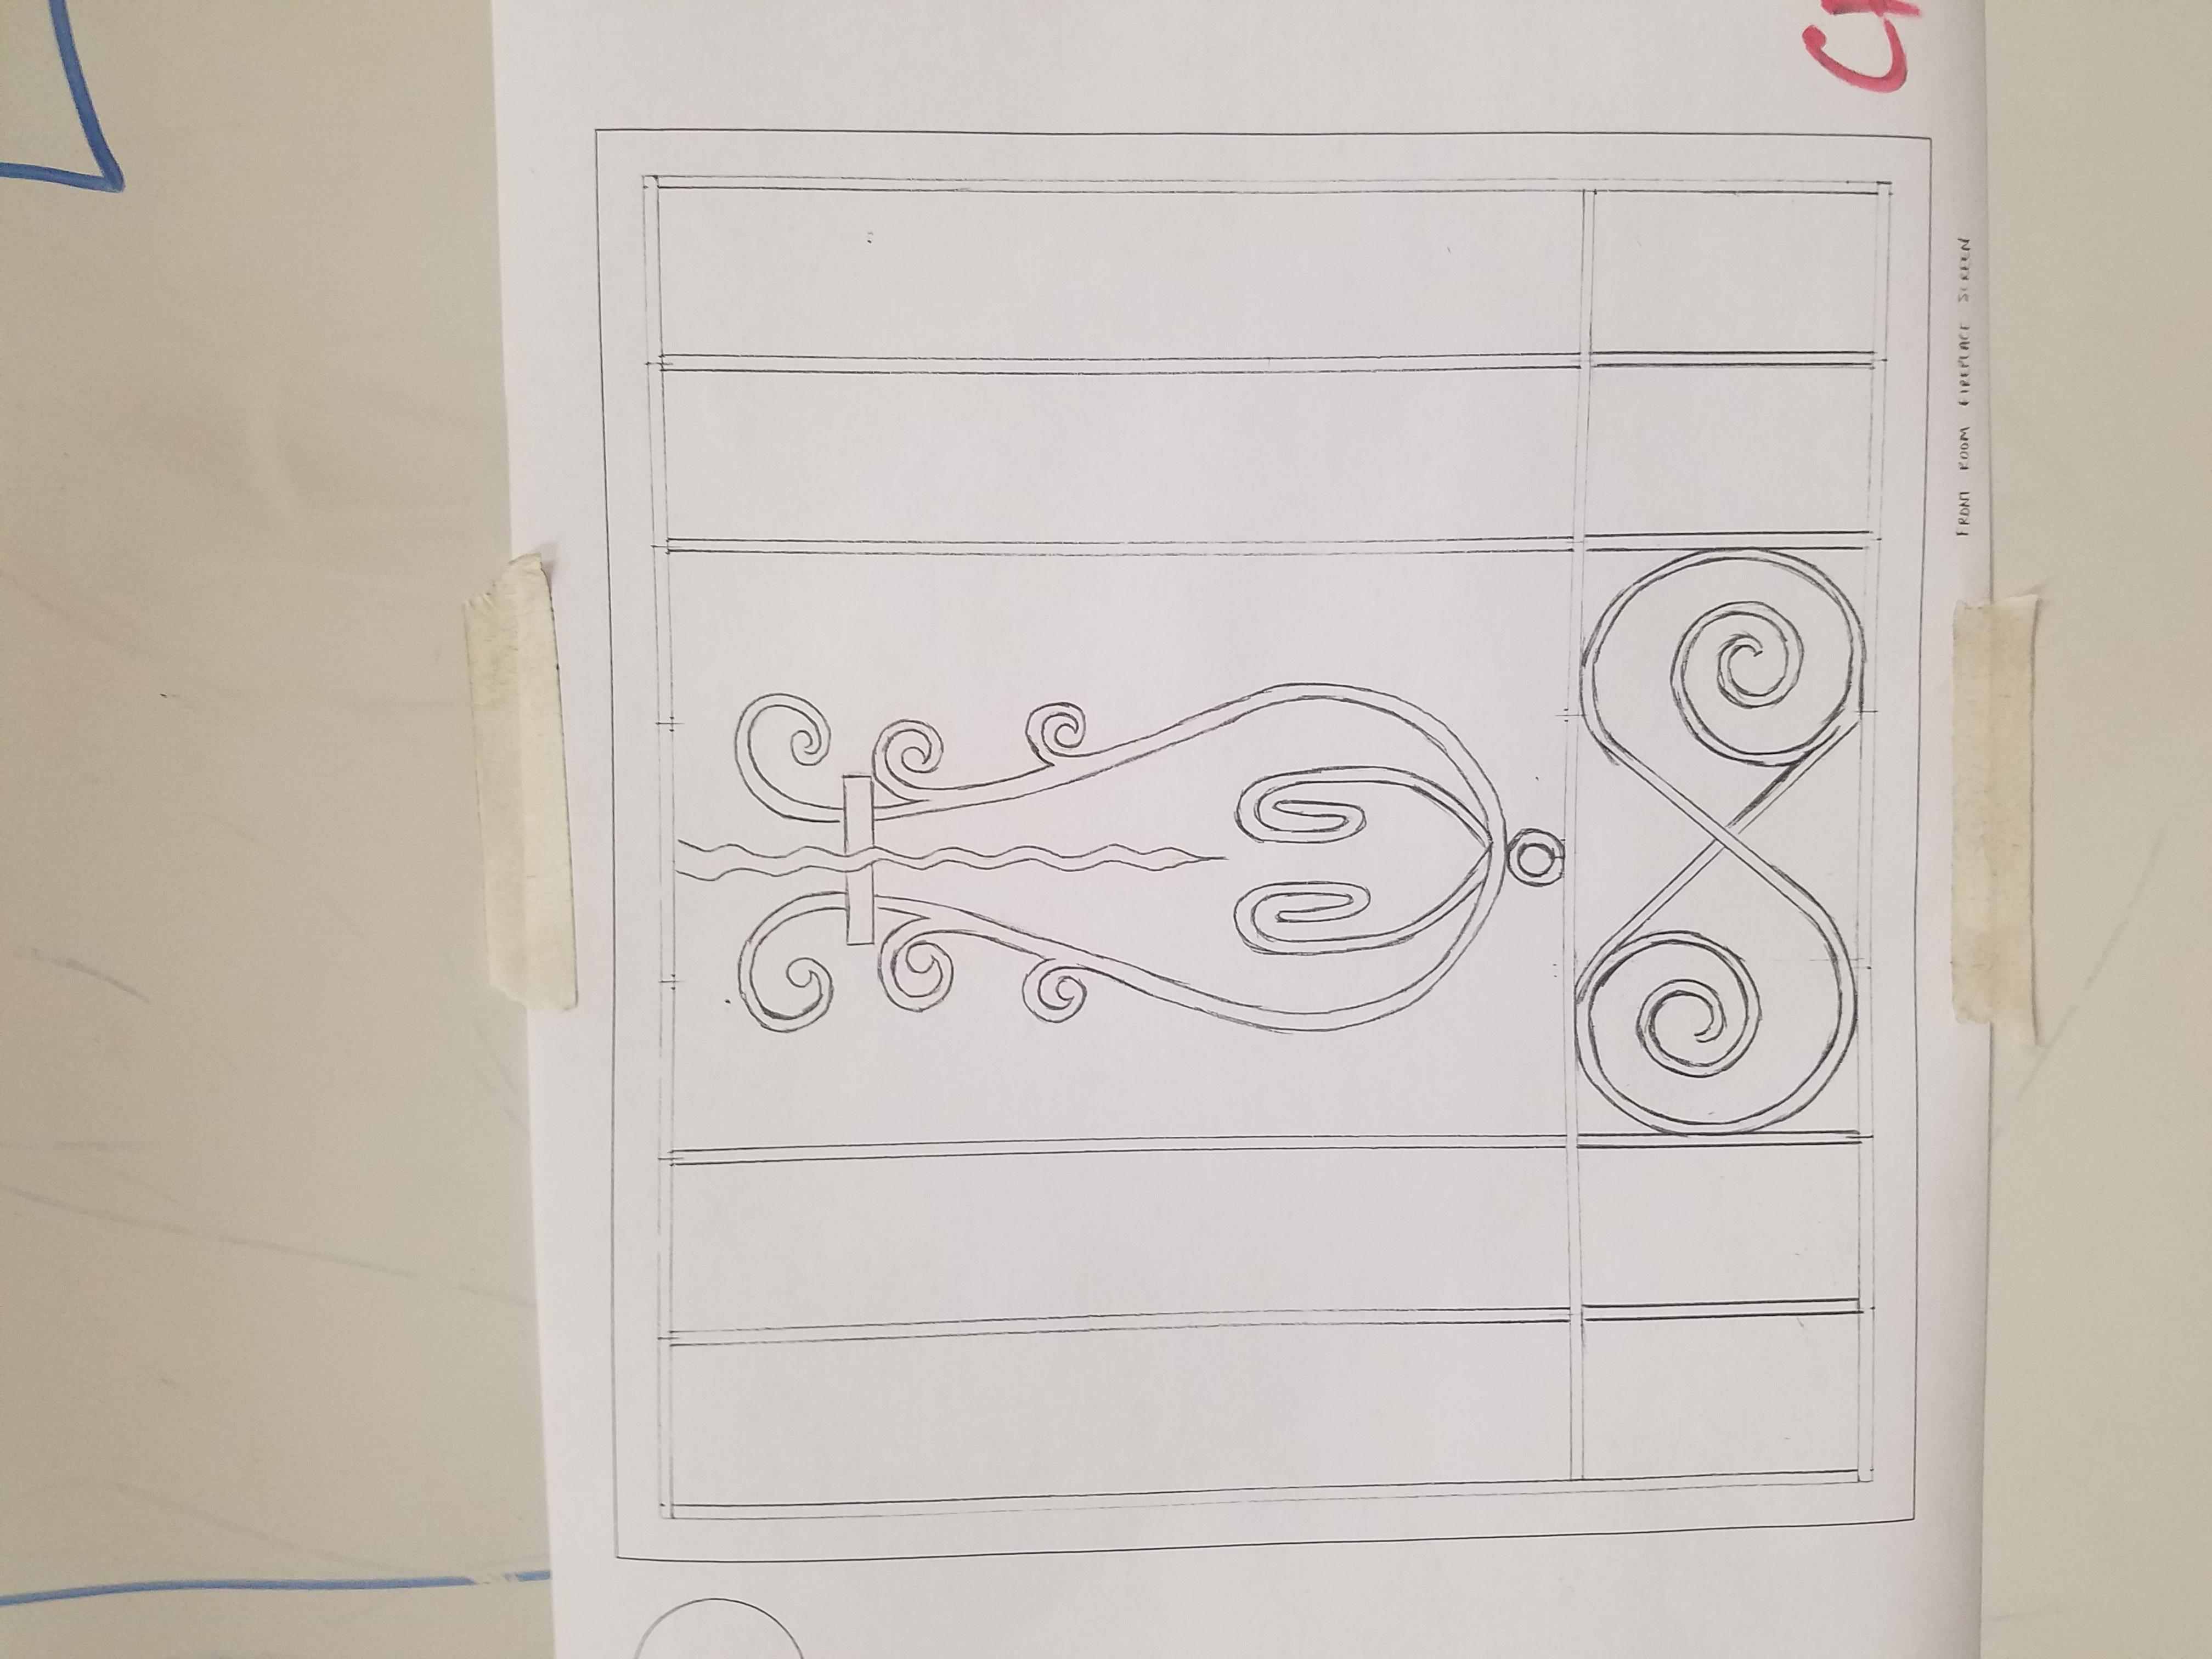 Fire grate design